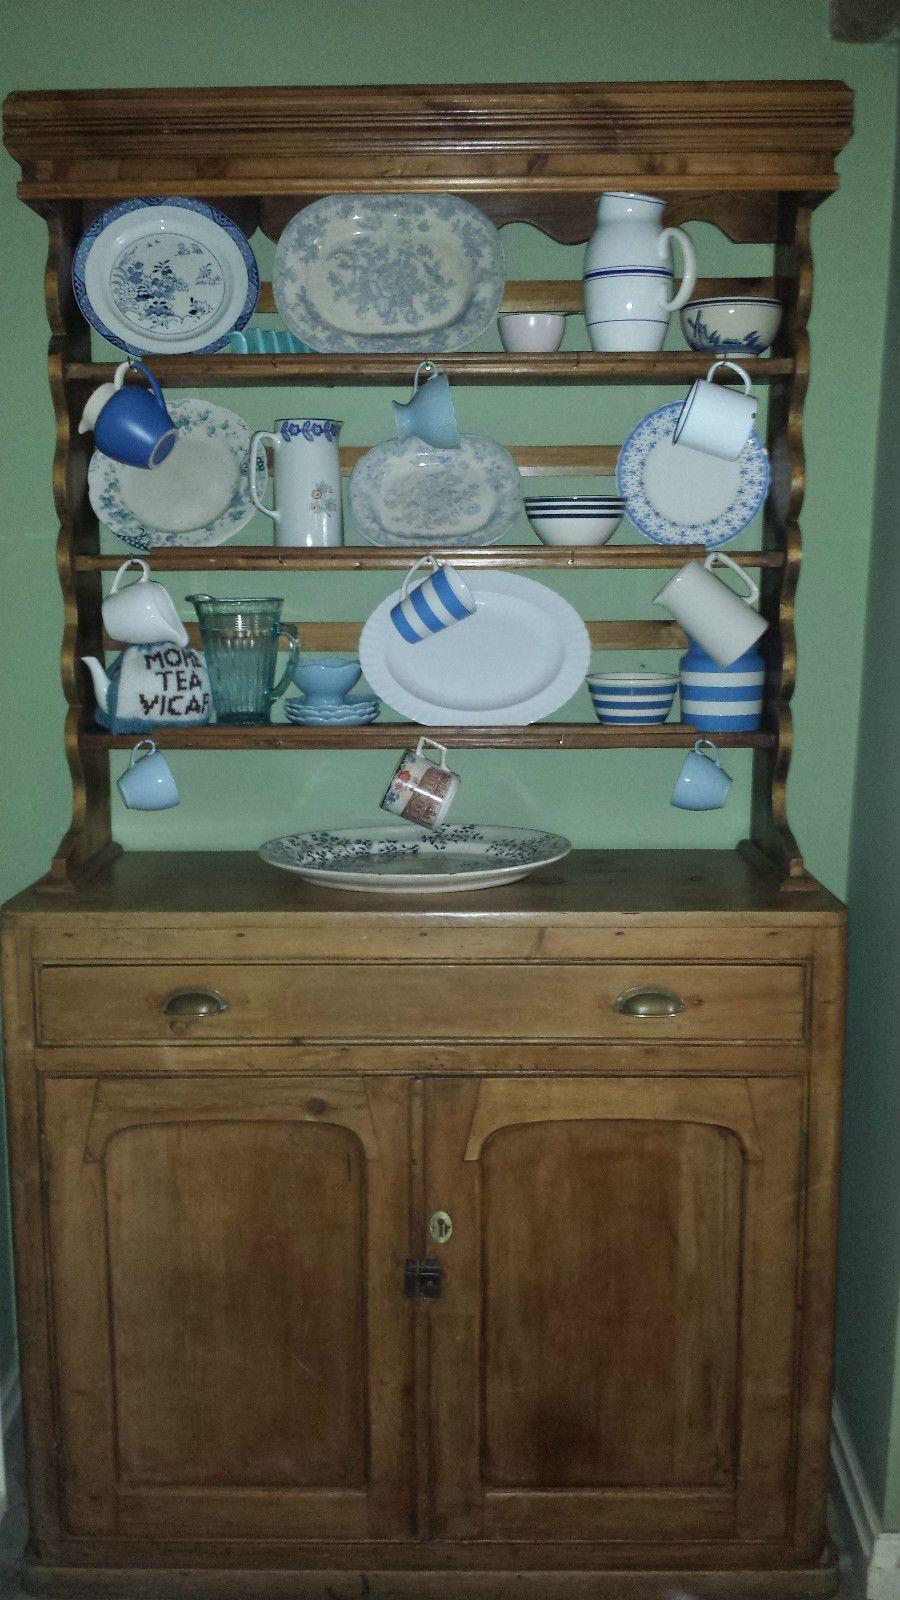 Antique Vintage Solid Wood Pine Irish Welsh Kitchen Dresser Rustic Plate Rack | eBay & Antique Vintage Solid Wood Pine Irish Welsh Kitchen Dresser Rustic ...